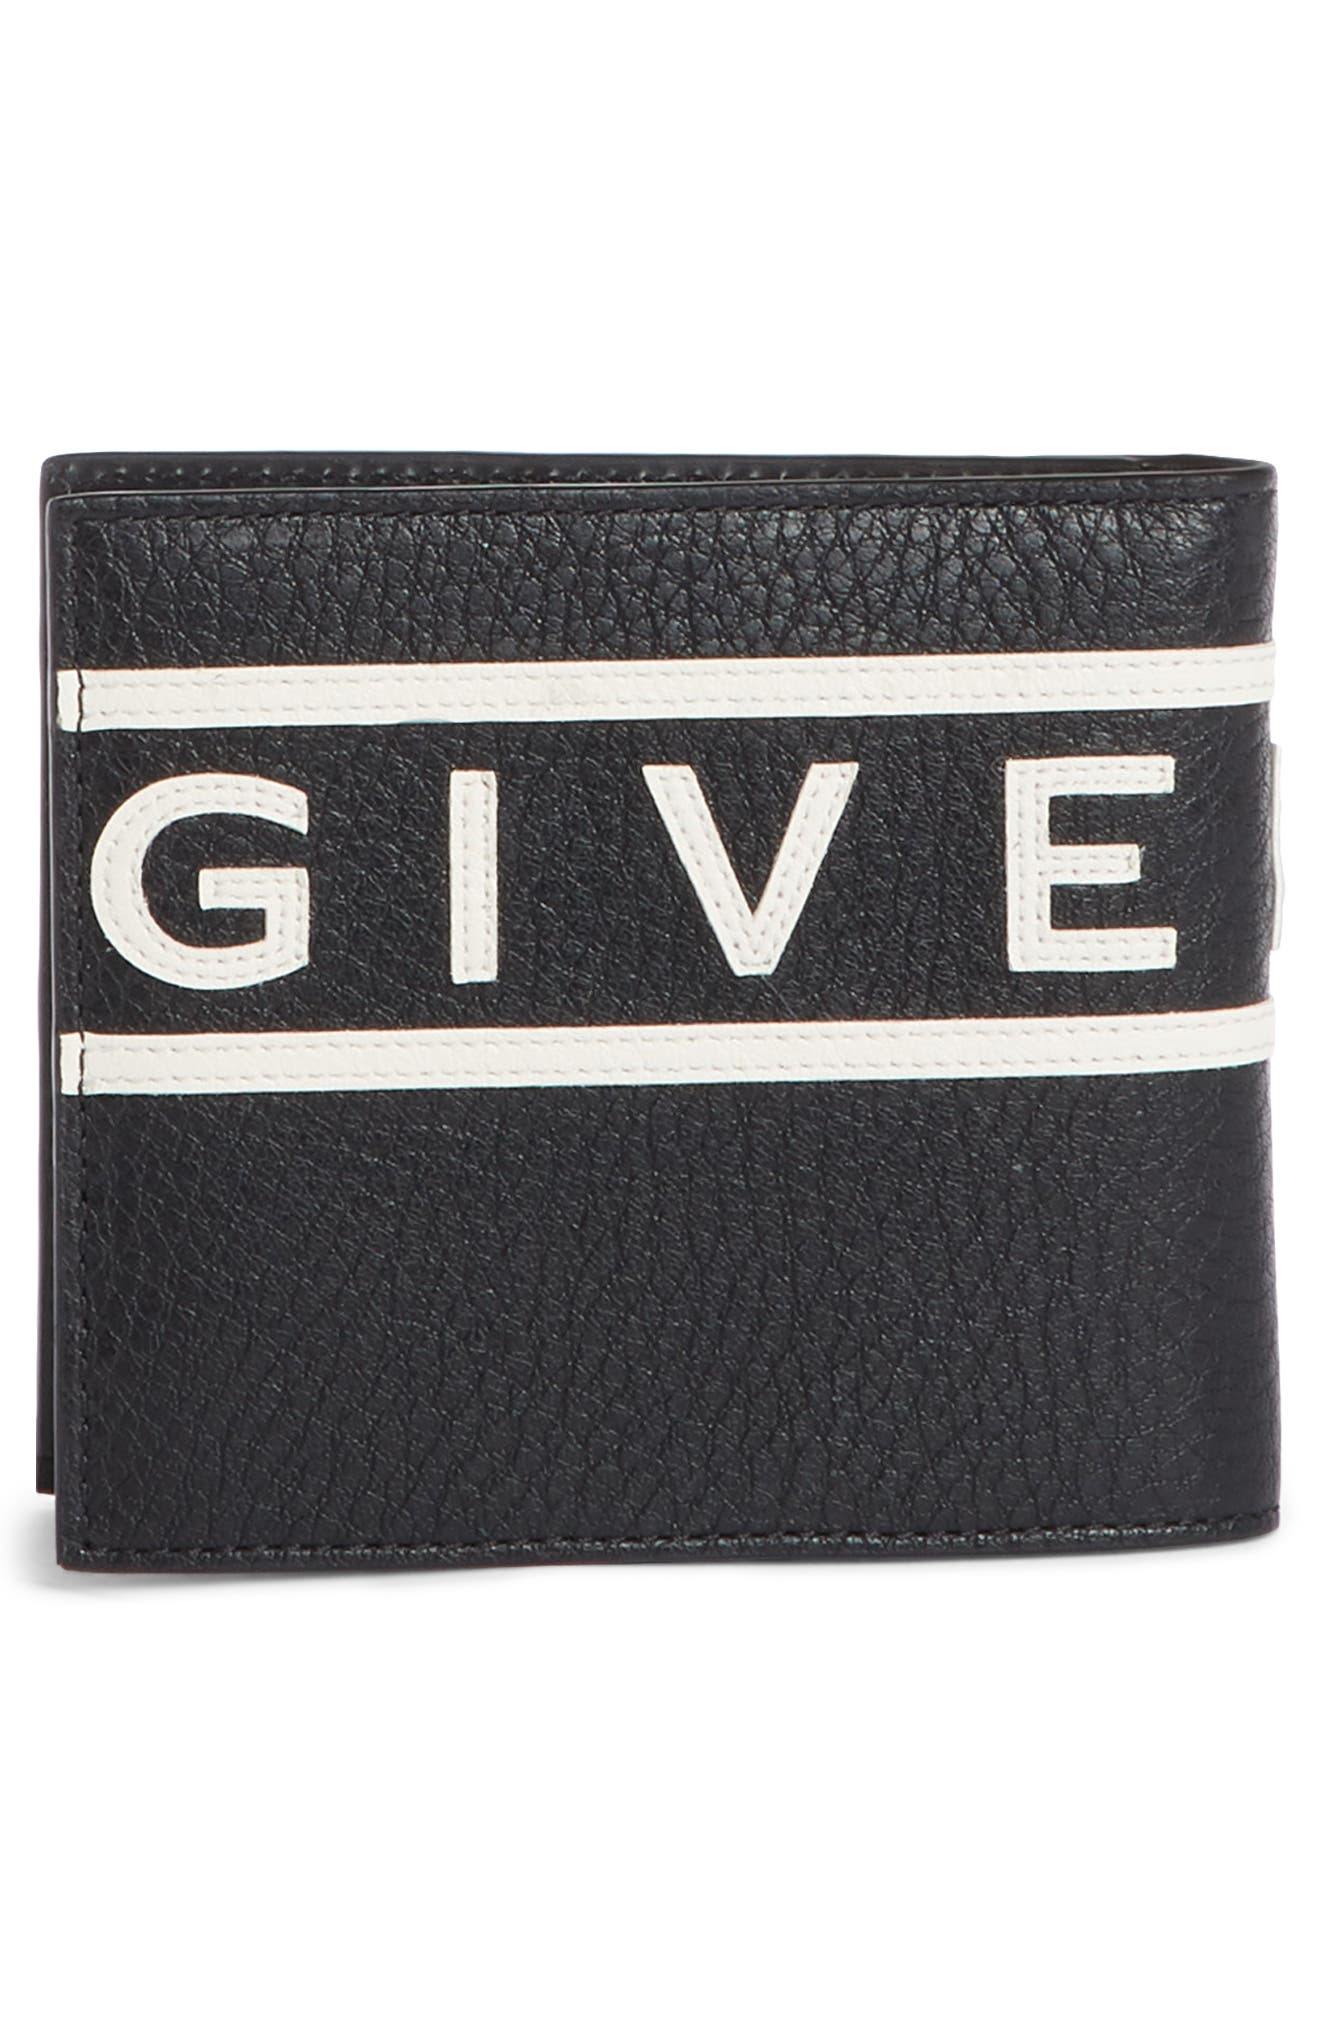 GIVENCHY,                             Logo Calfskin Leather Wallet,                             Alternate thumbnail 3, color,                             BLACK